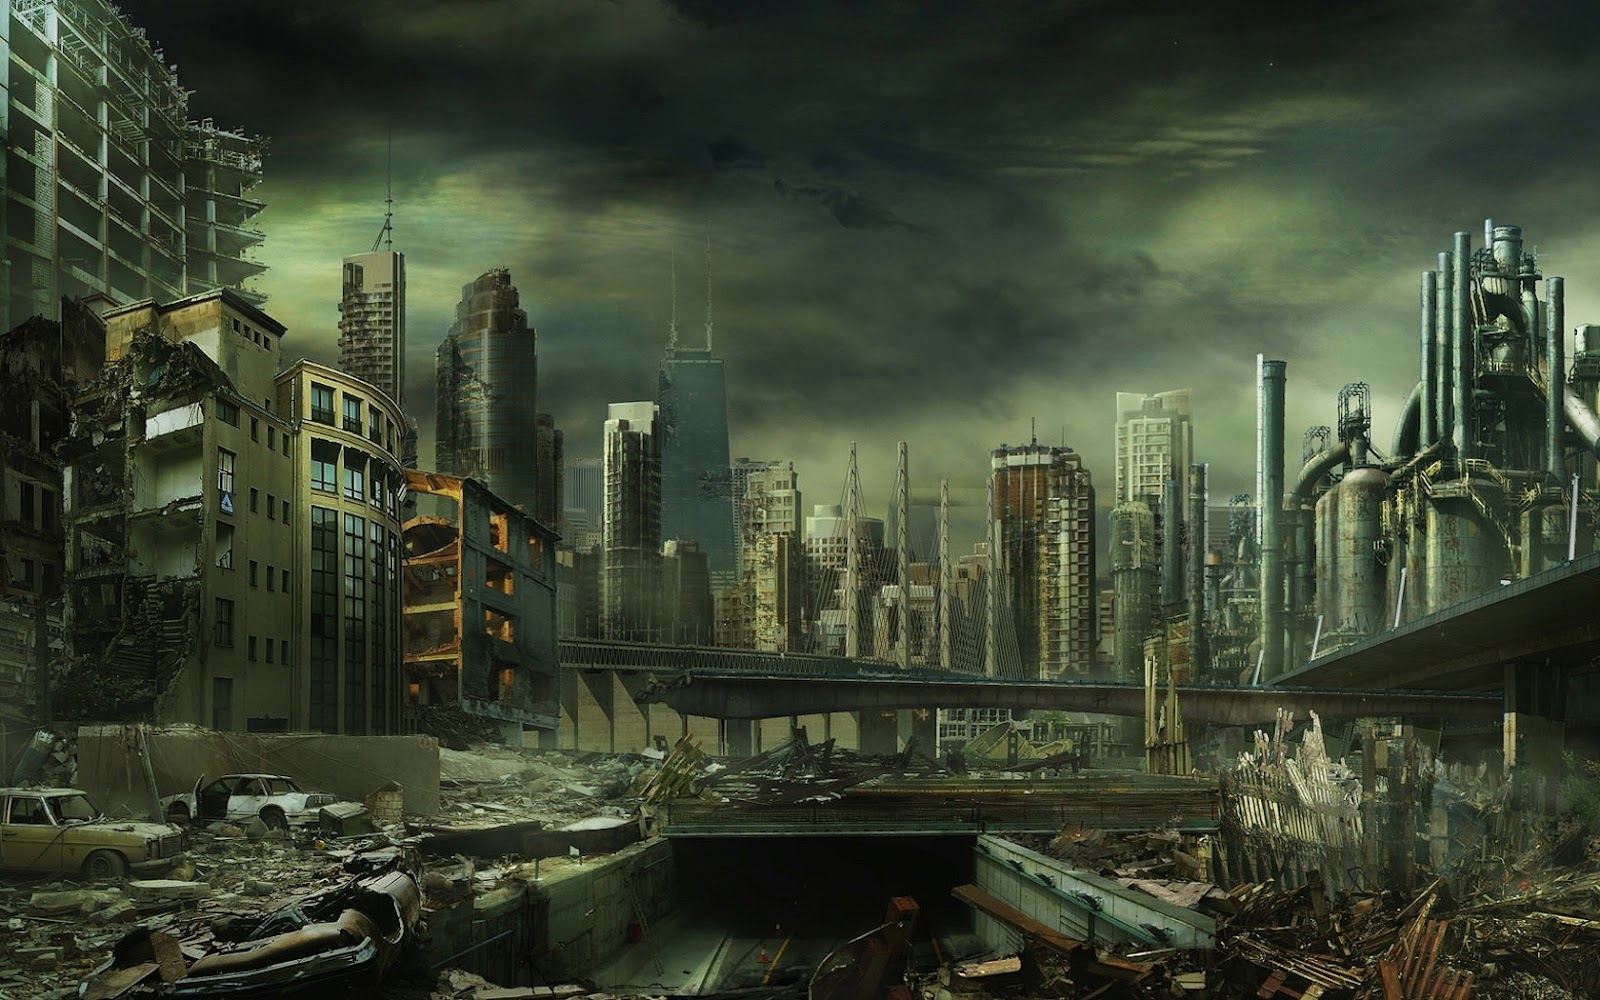 http://4.bp.blogspot.com/-Xy1V8hsUPa8/T2YFyaR180I/AAAAAAAAK4c/gwdvl8oVr-A/s1600/Other_Worlds_Fantasy_Wallpaper_Cityscape+1680x1050.jpg